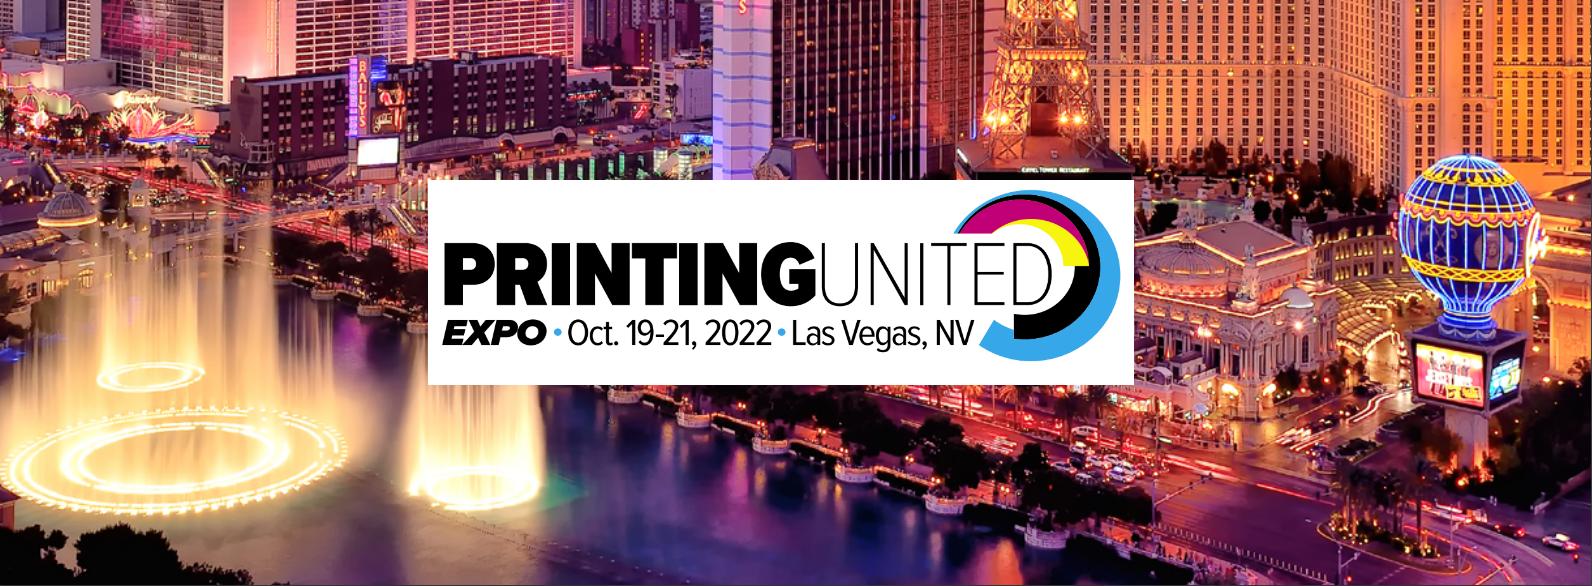 19-21 October 2022 PRINTING UNITED - LAS VEGAS, U.S.A